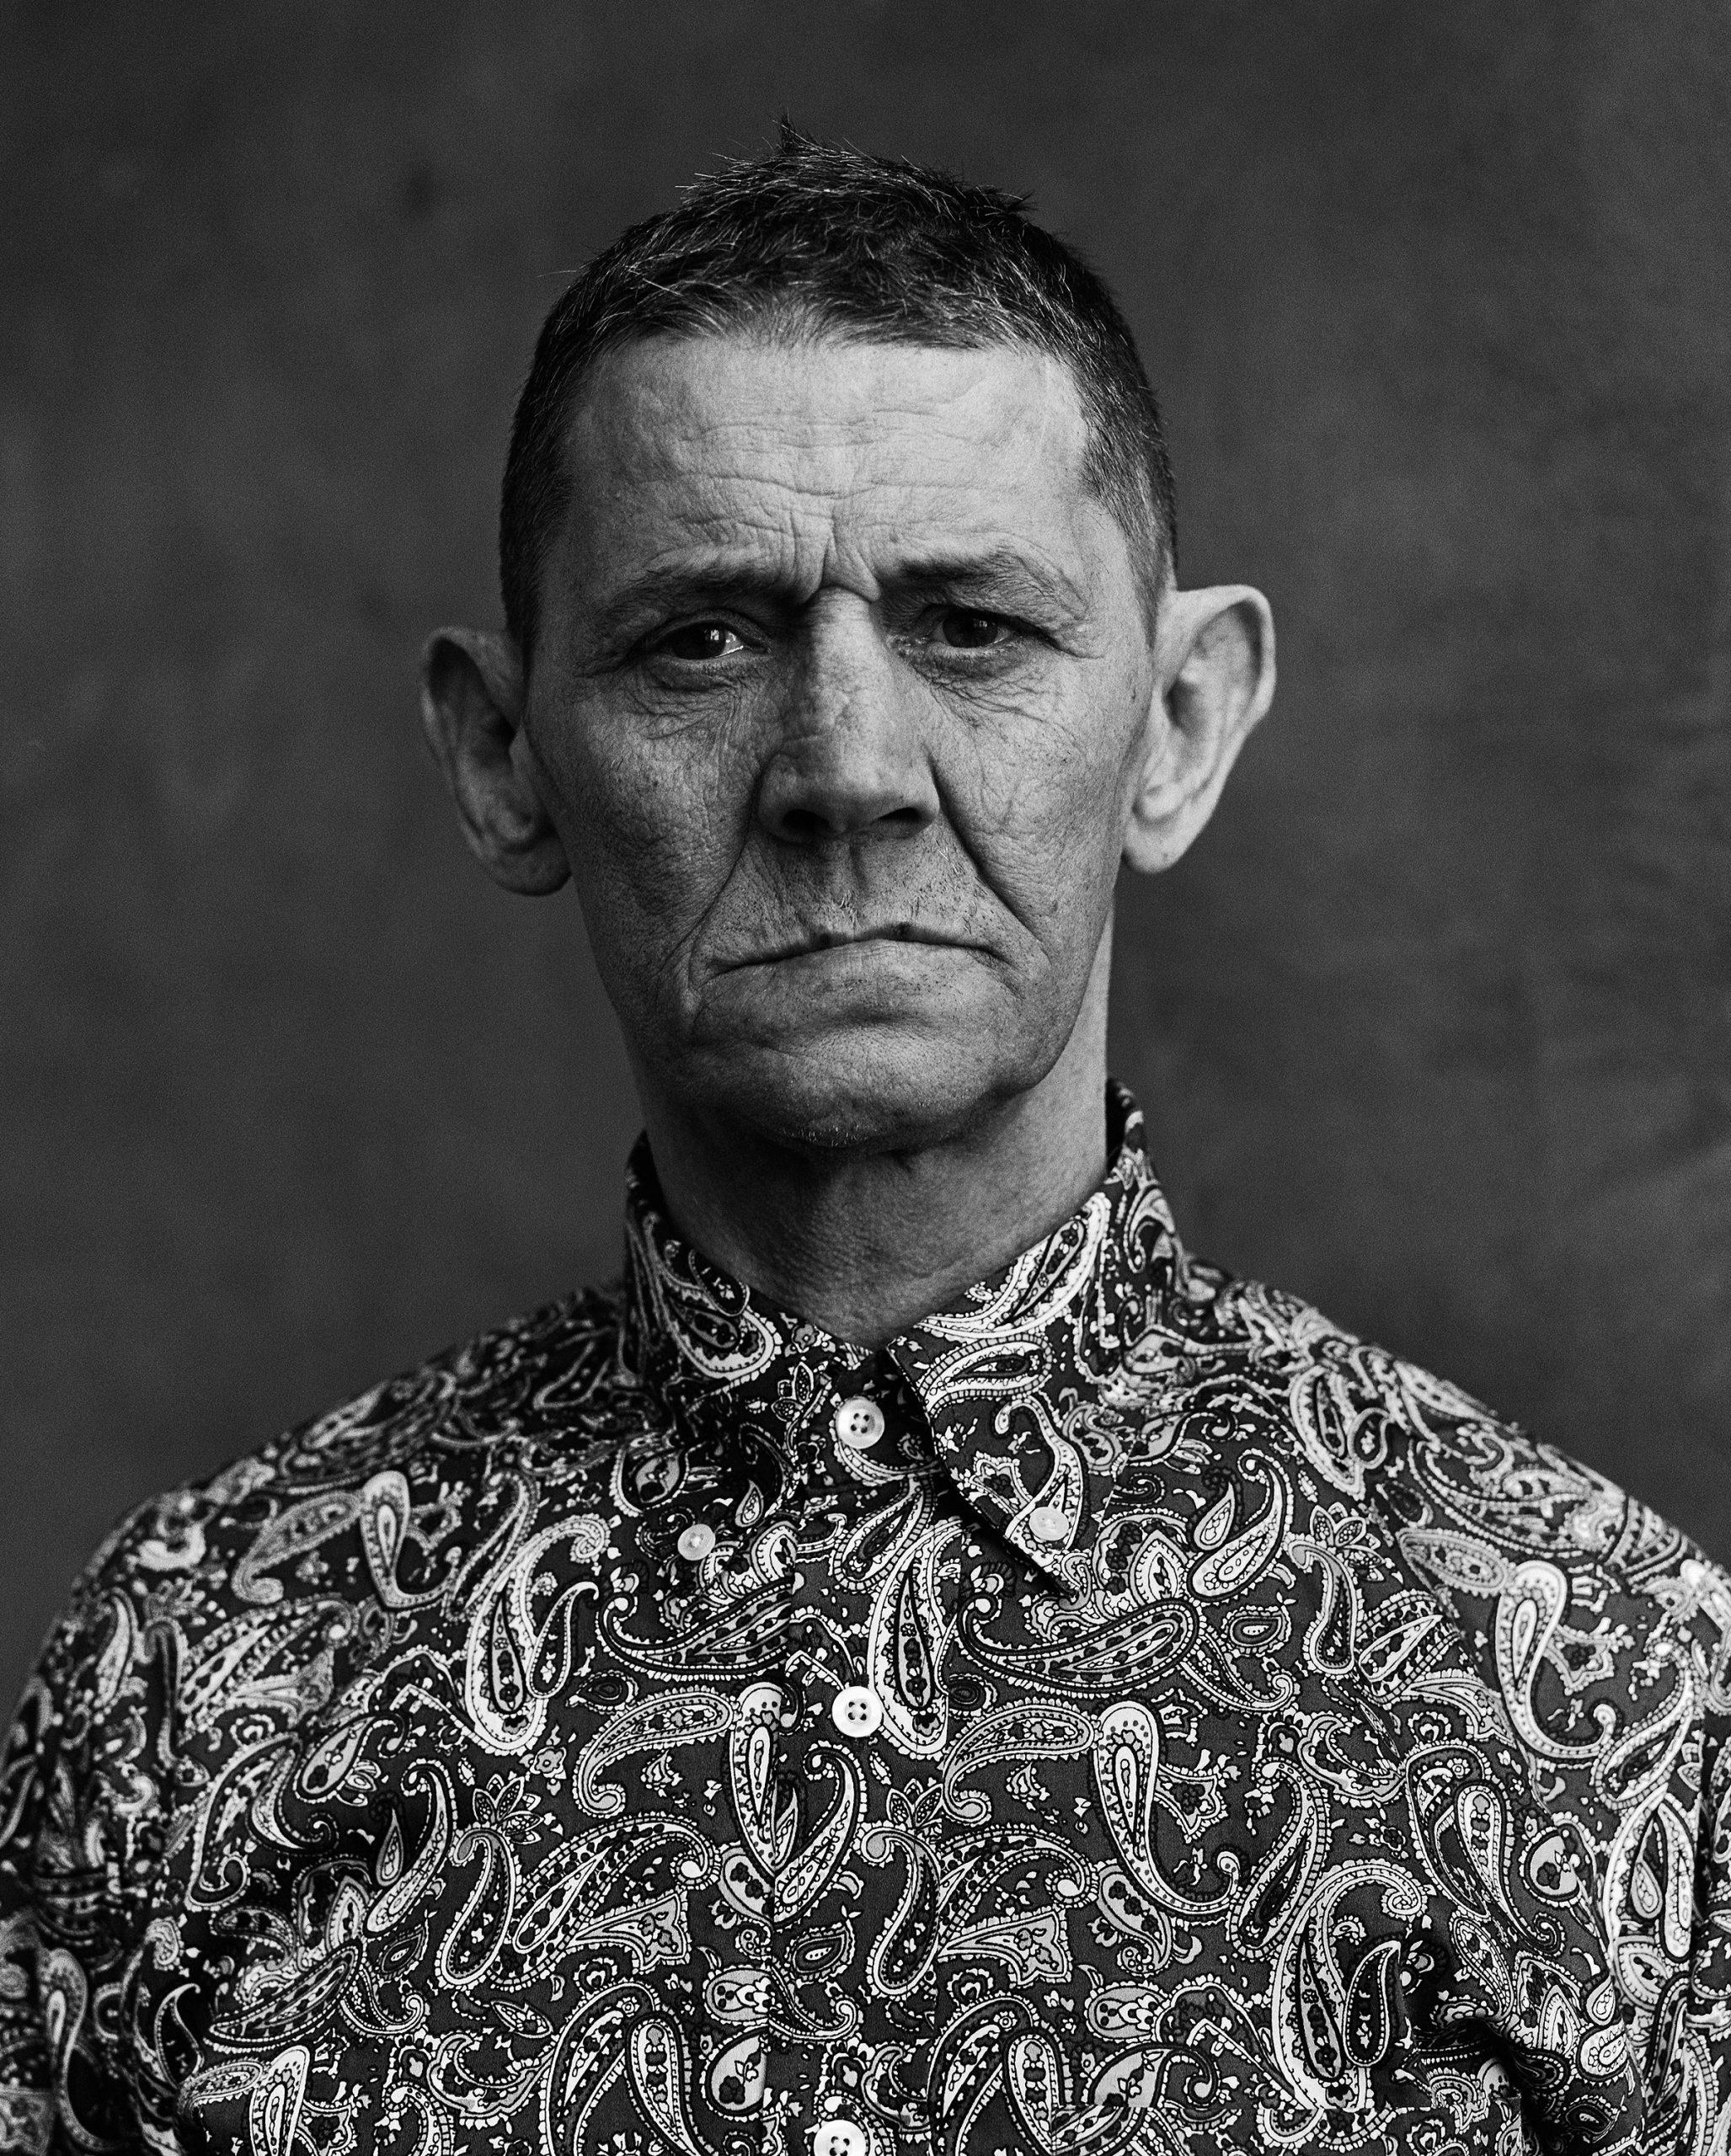 Medium format analog black&white portrait photograph of a man in Glasgow, Scotland by Simon Murphy